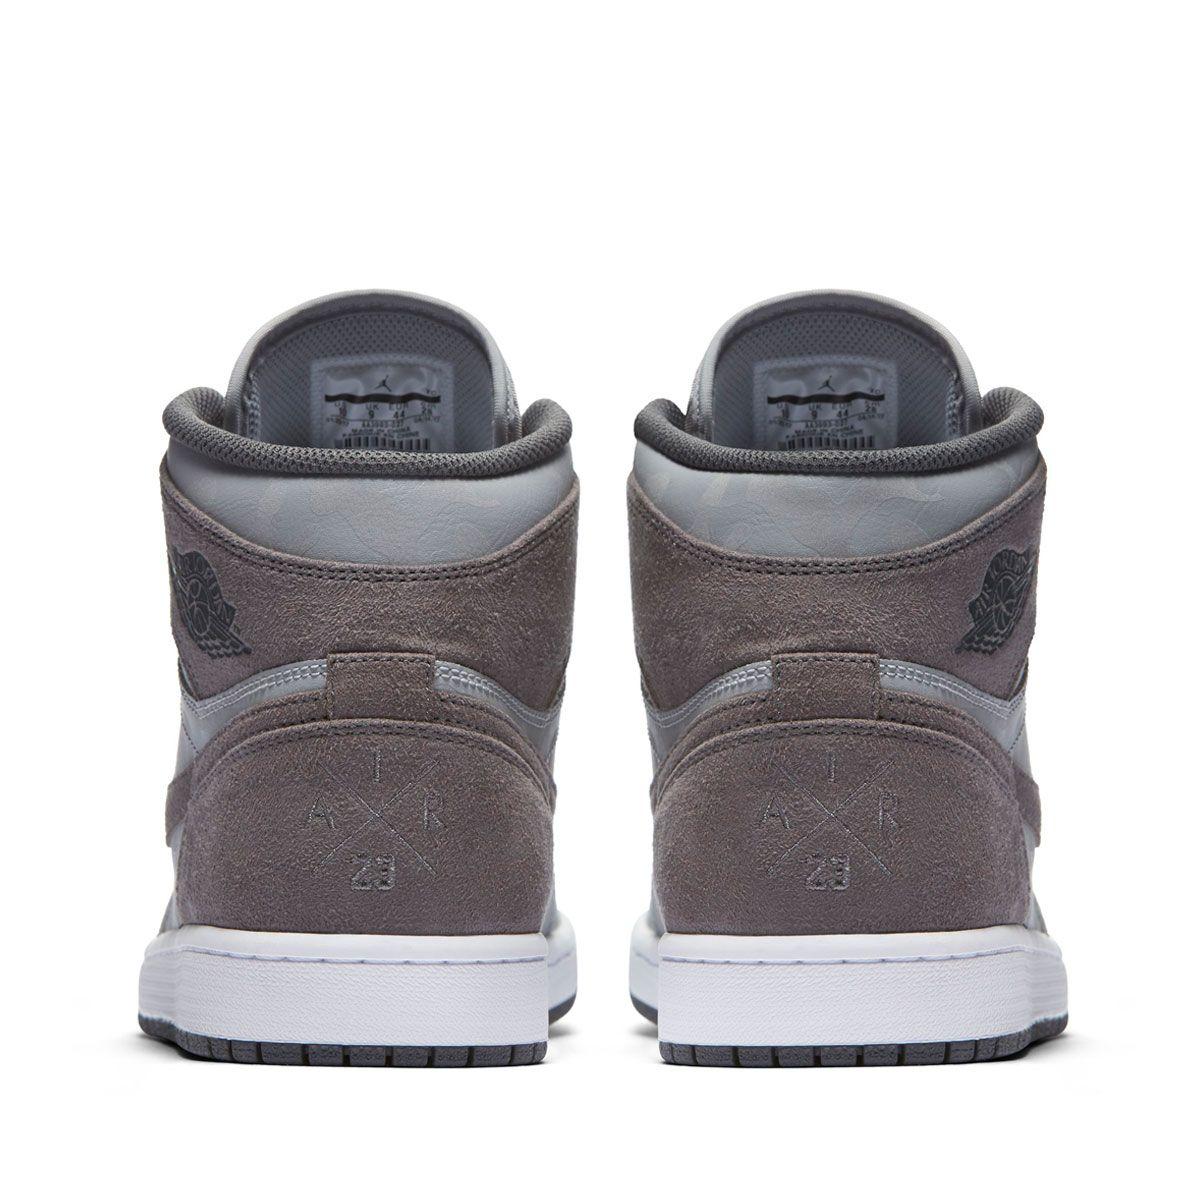 "Preview Air Jordan 1 Retro High Premium ""Wolf Grey Camo"